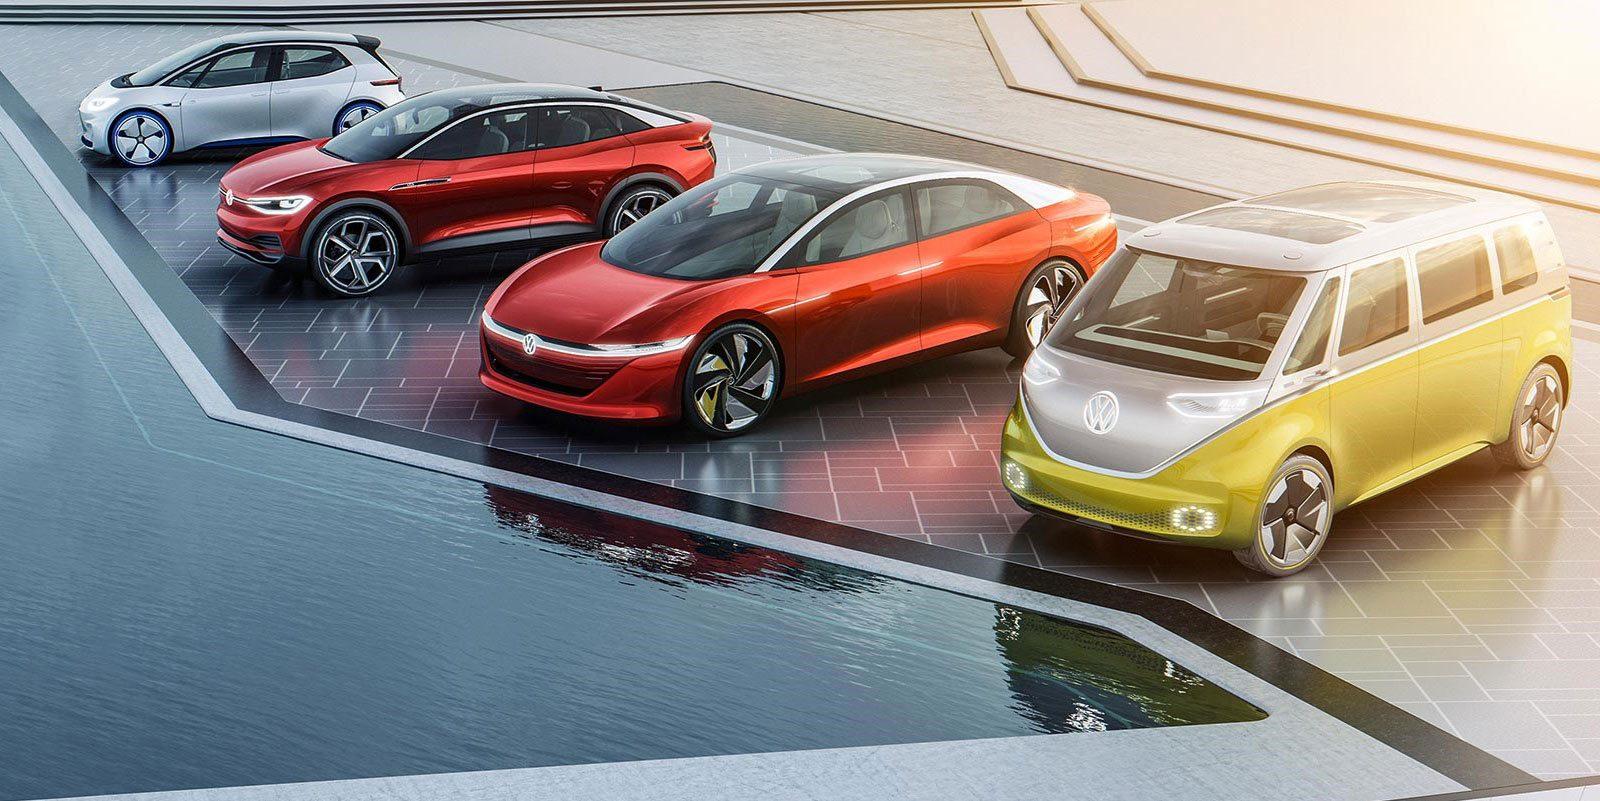 Vw car electric models